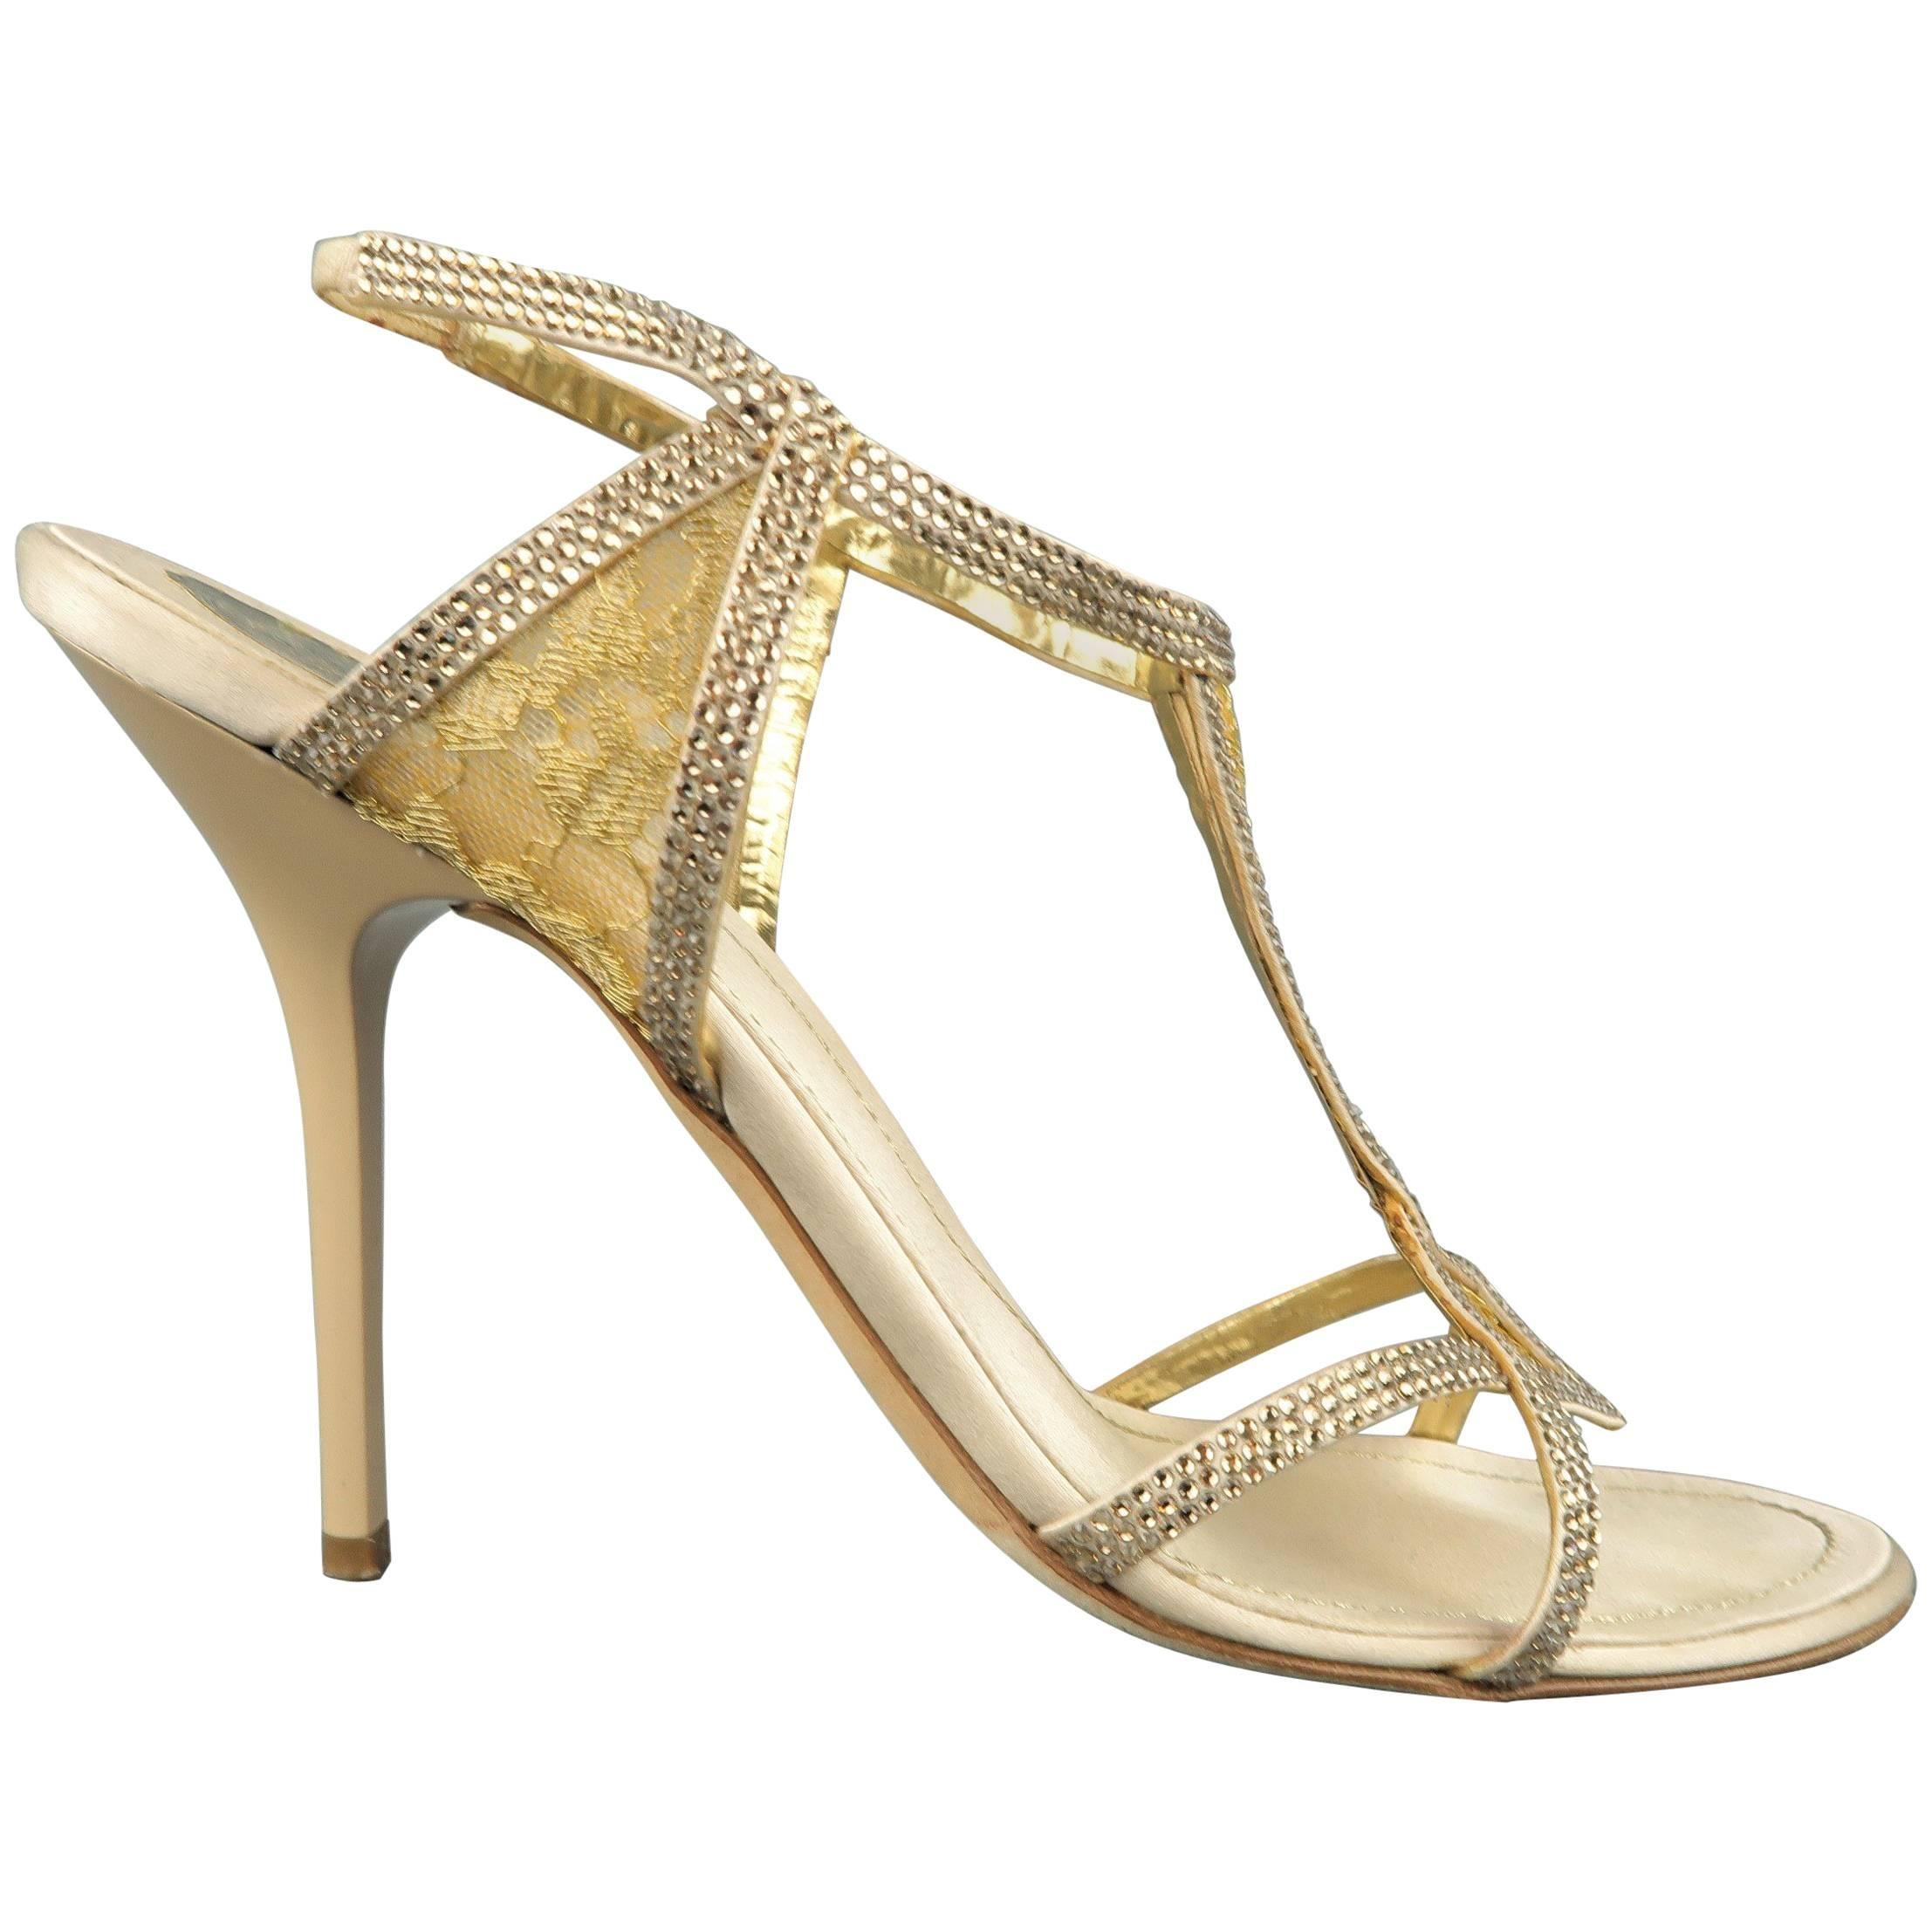 RENE CAOVILLA Size 10 Beige Rhinestone Leather & Gold Lace Sandals